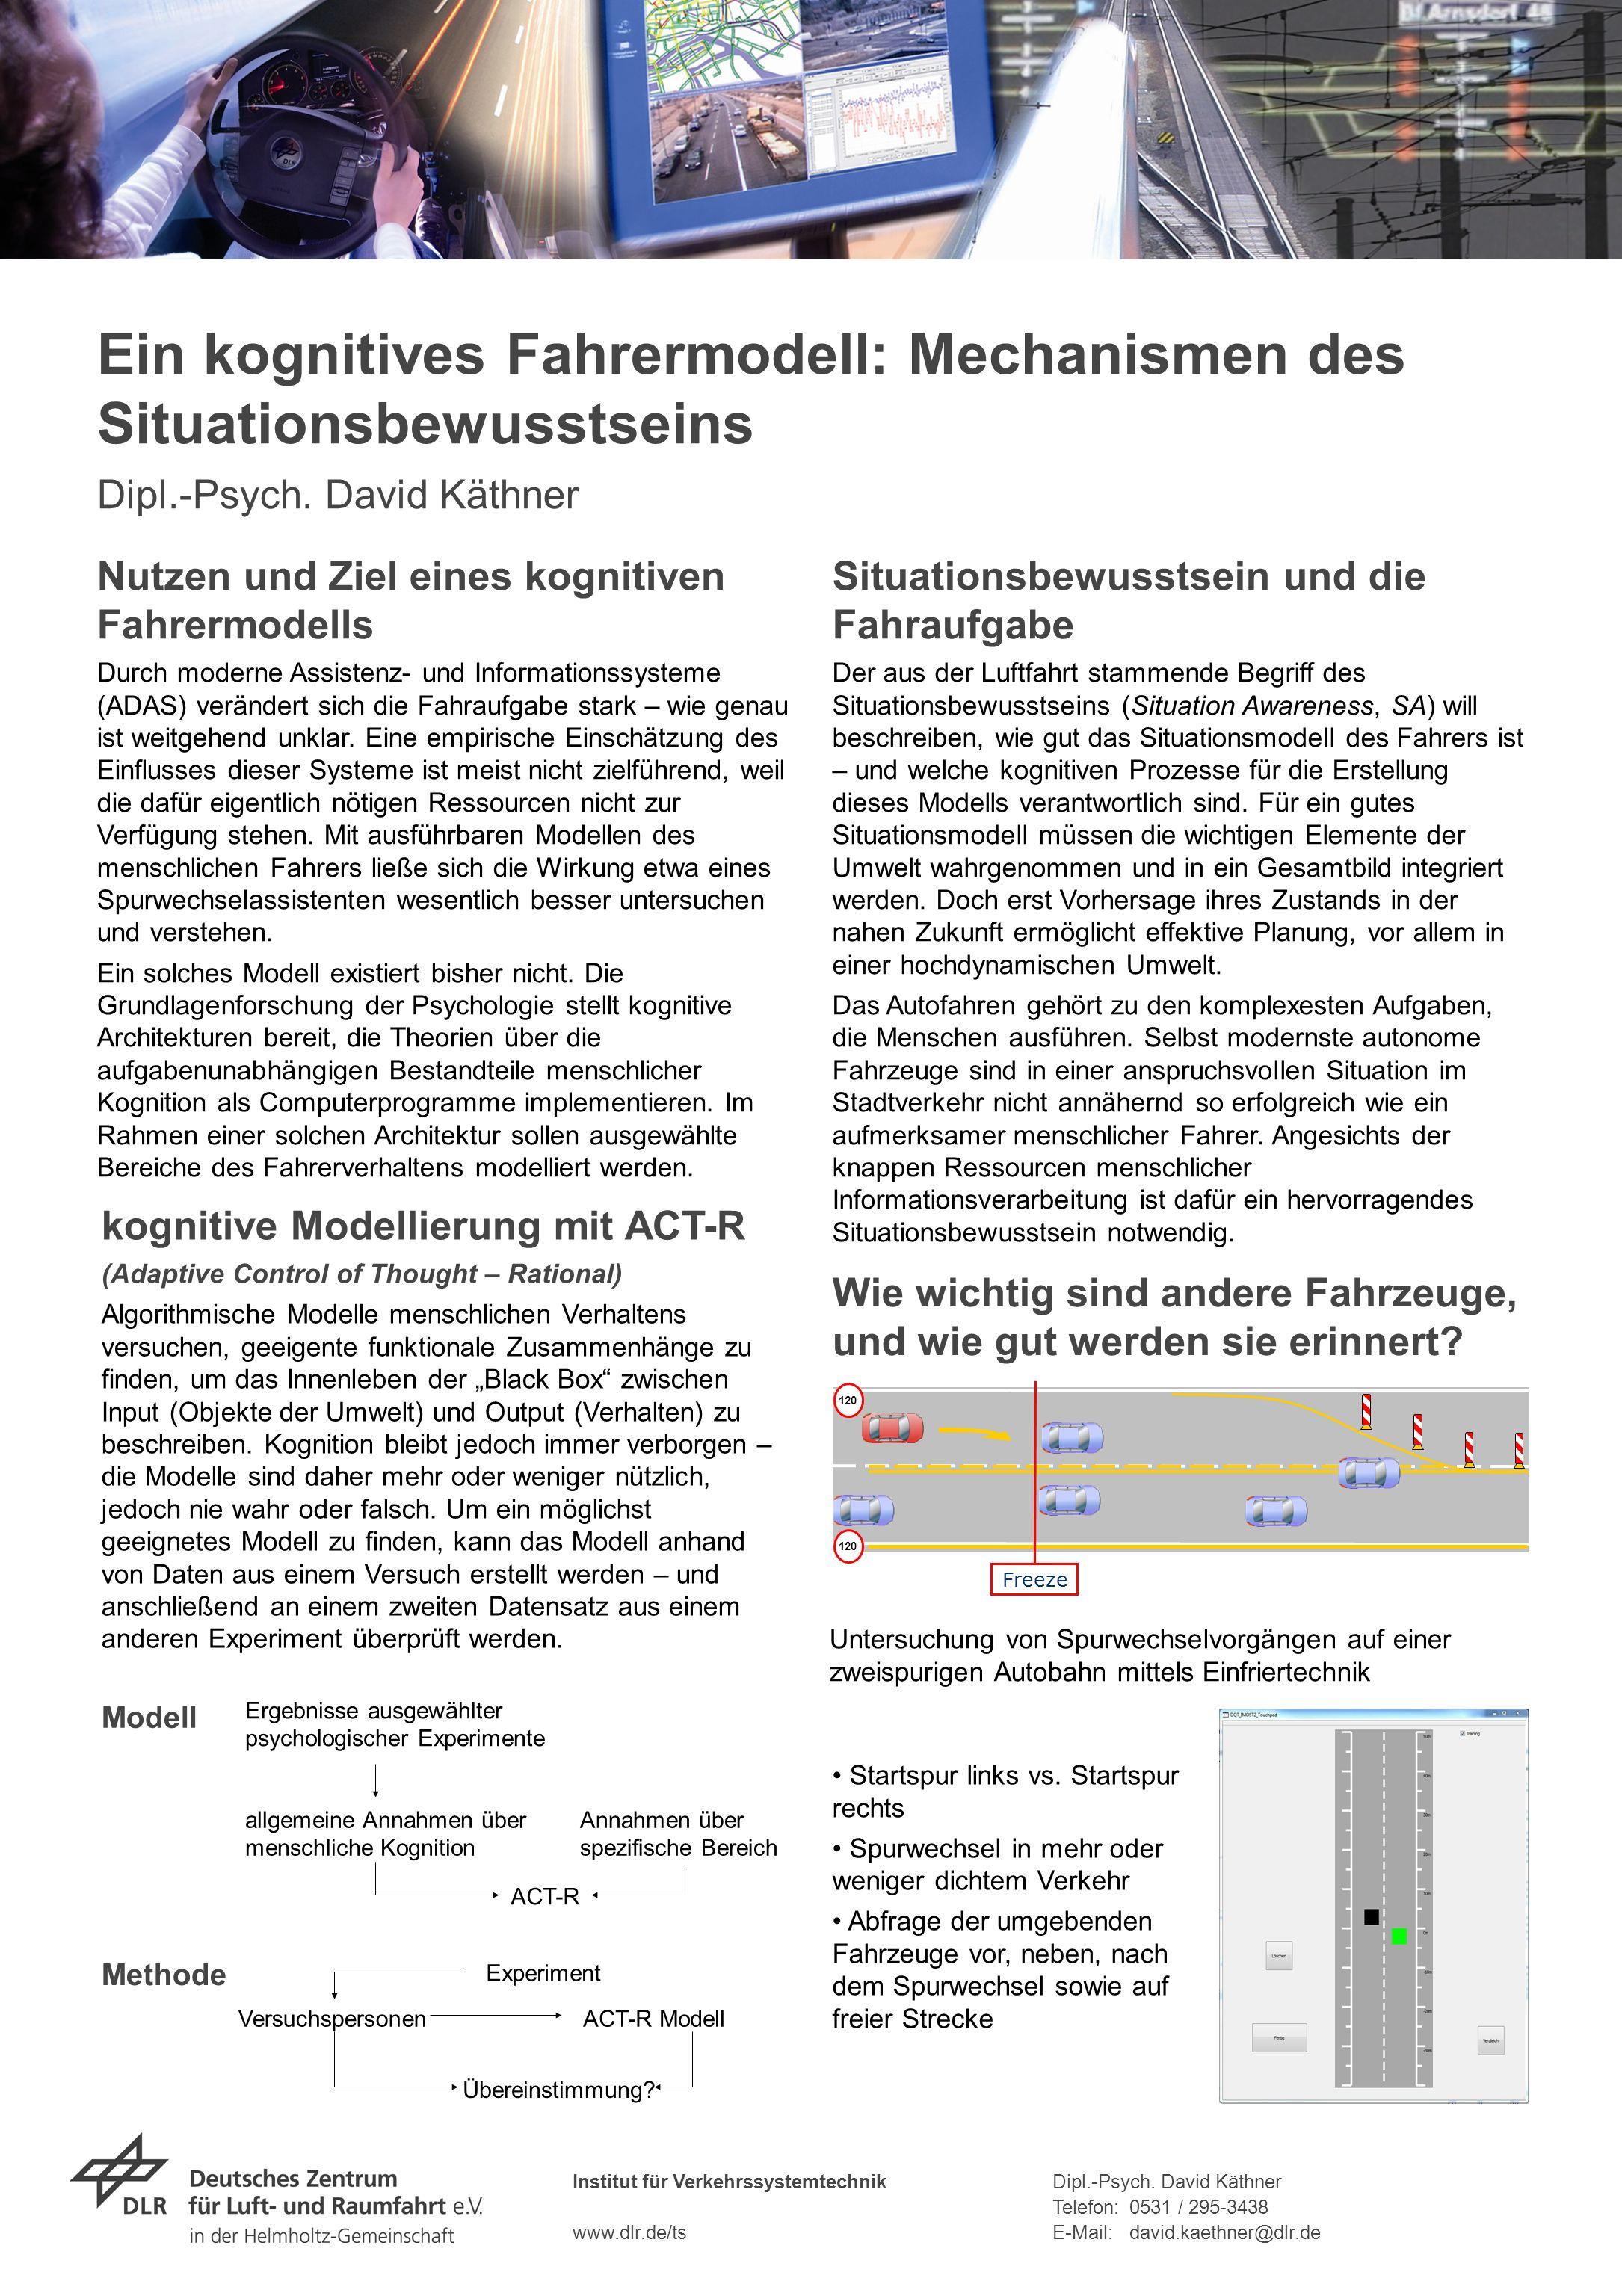 Institut für Verkehrssystemtechnik www.dlr.de/ts Dipl.-Psych. David Käthner Telefon:0531 / 295-3438 E-Mail:david.kaethner@dlr.de Ein kognitives Fahrer